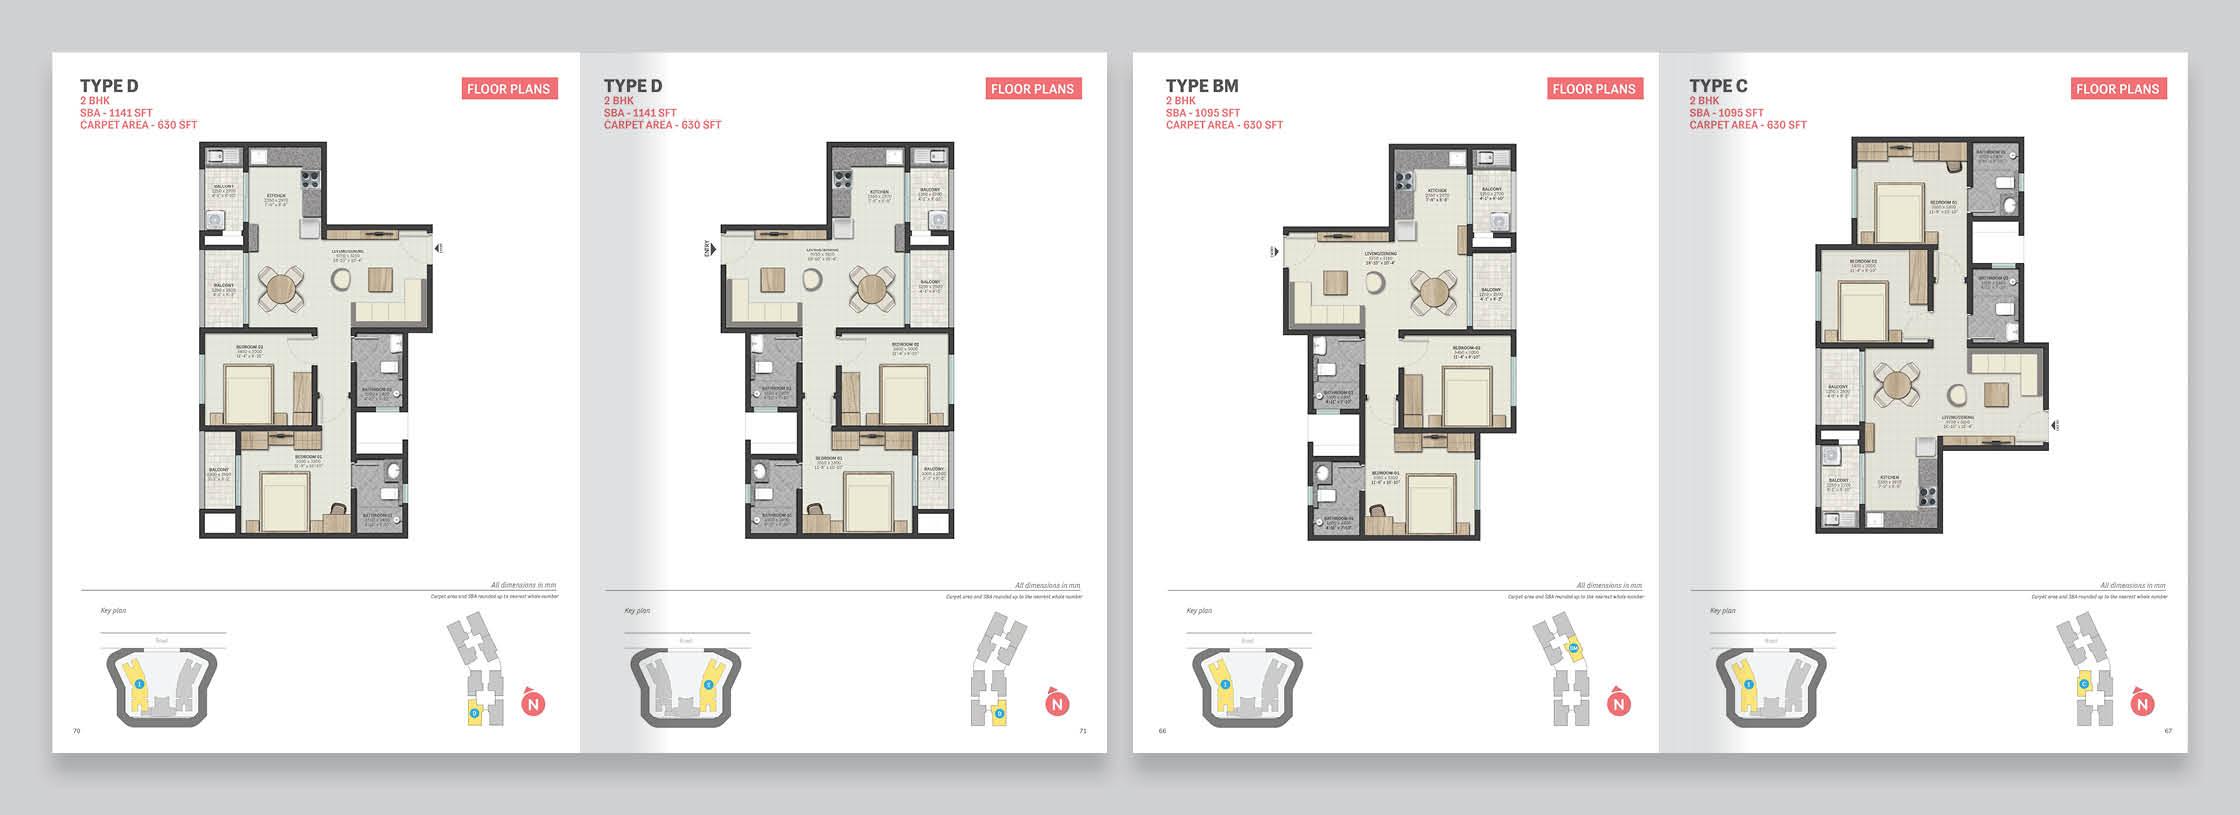 Real Estate Sobha Dream Heightsi Desgn 22